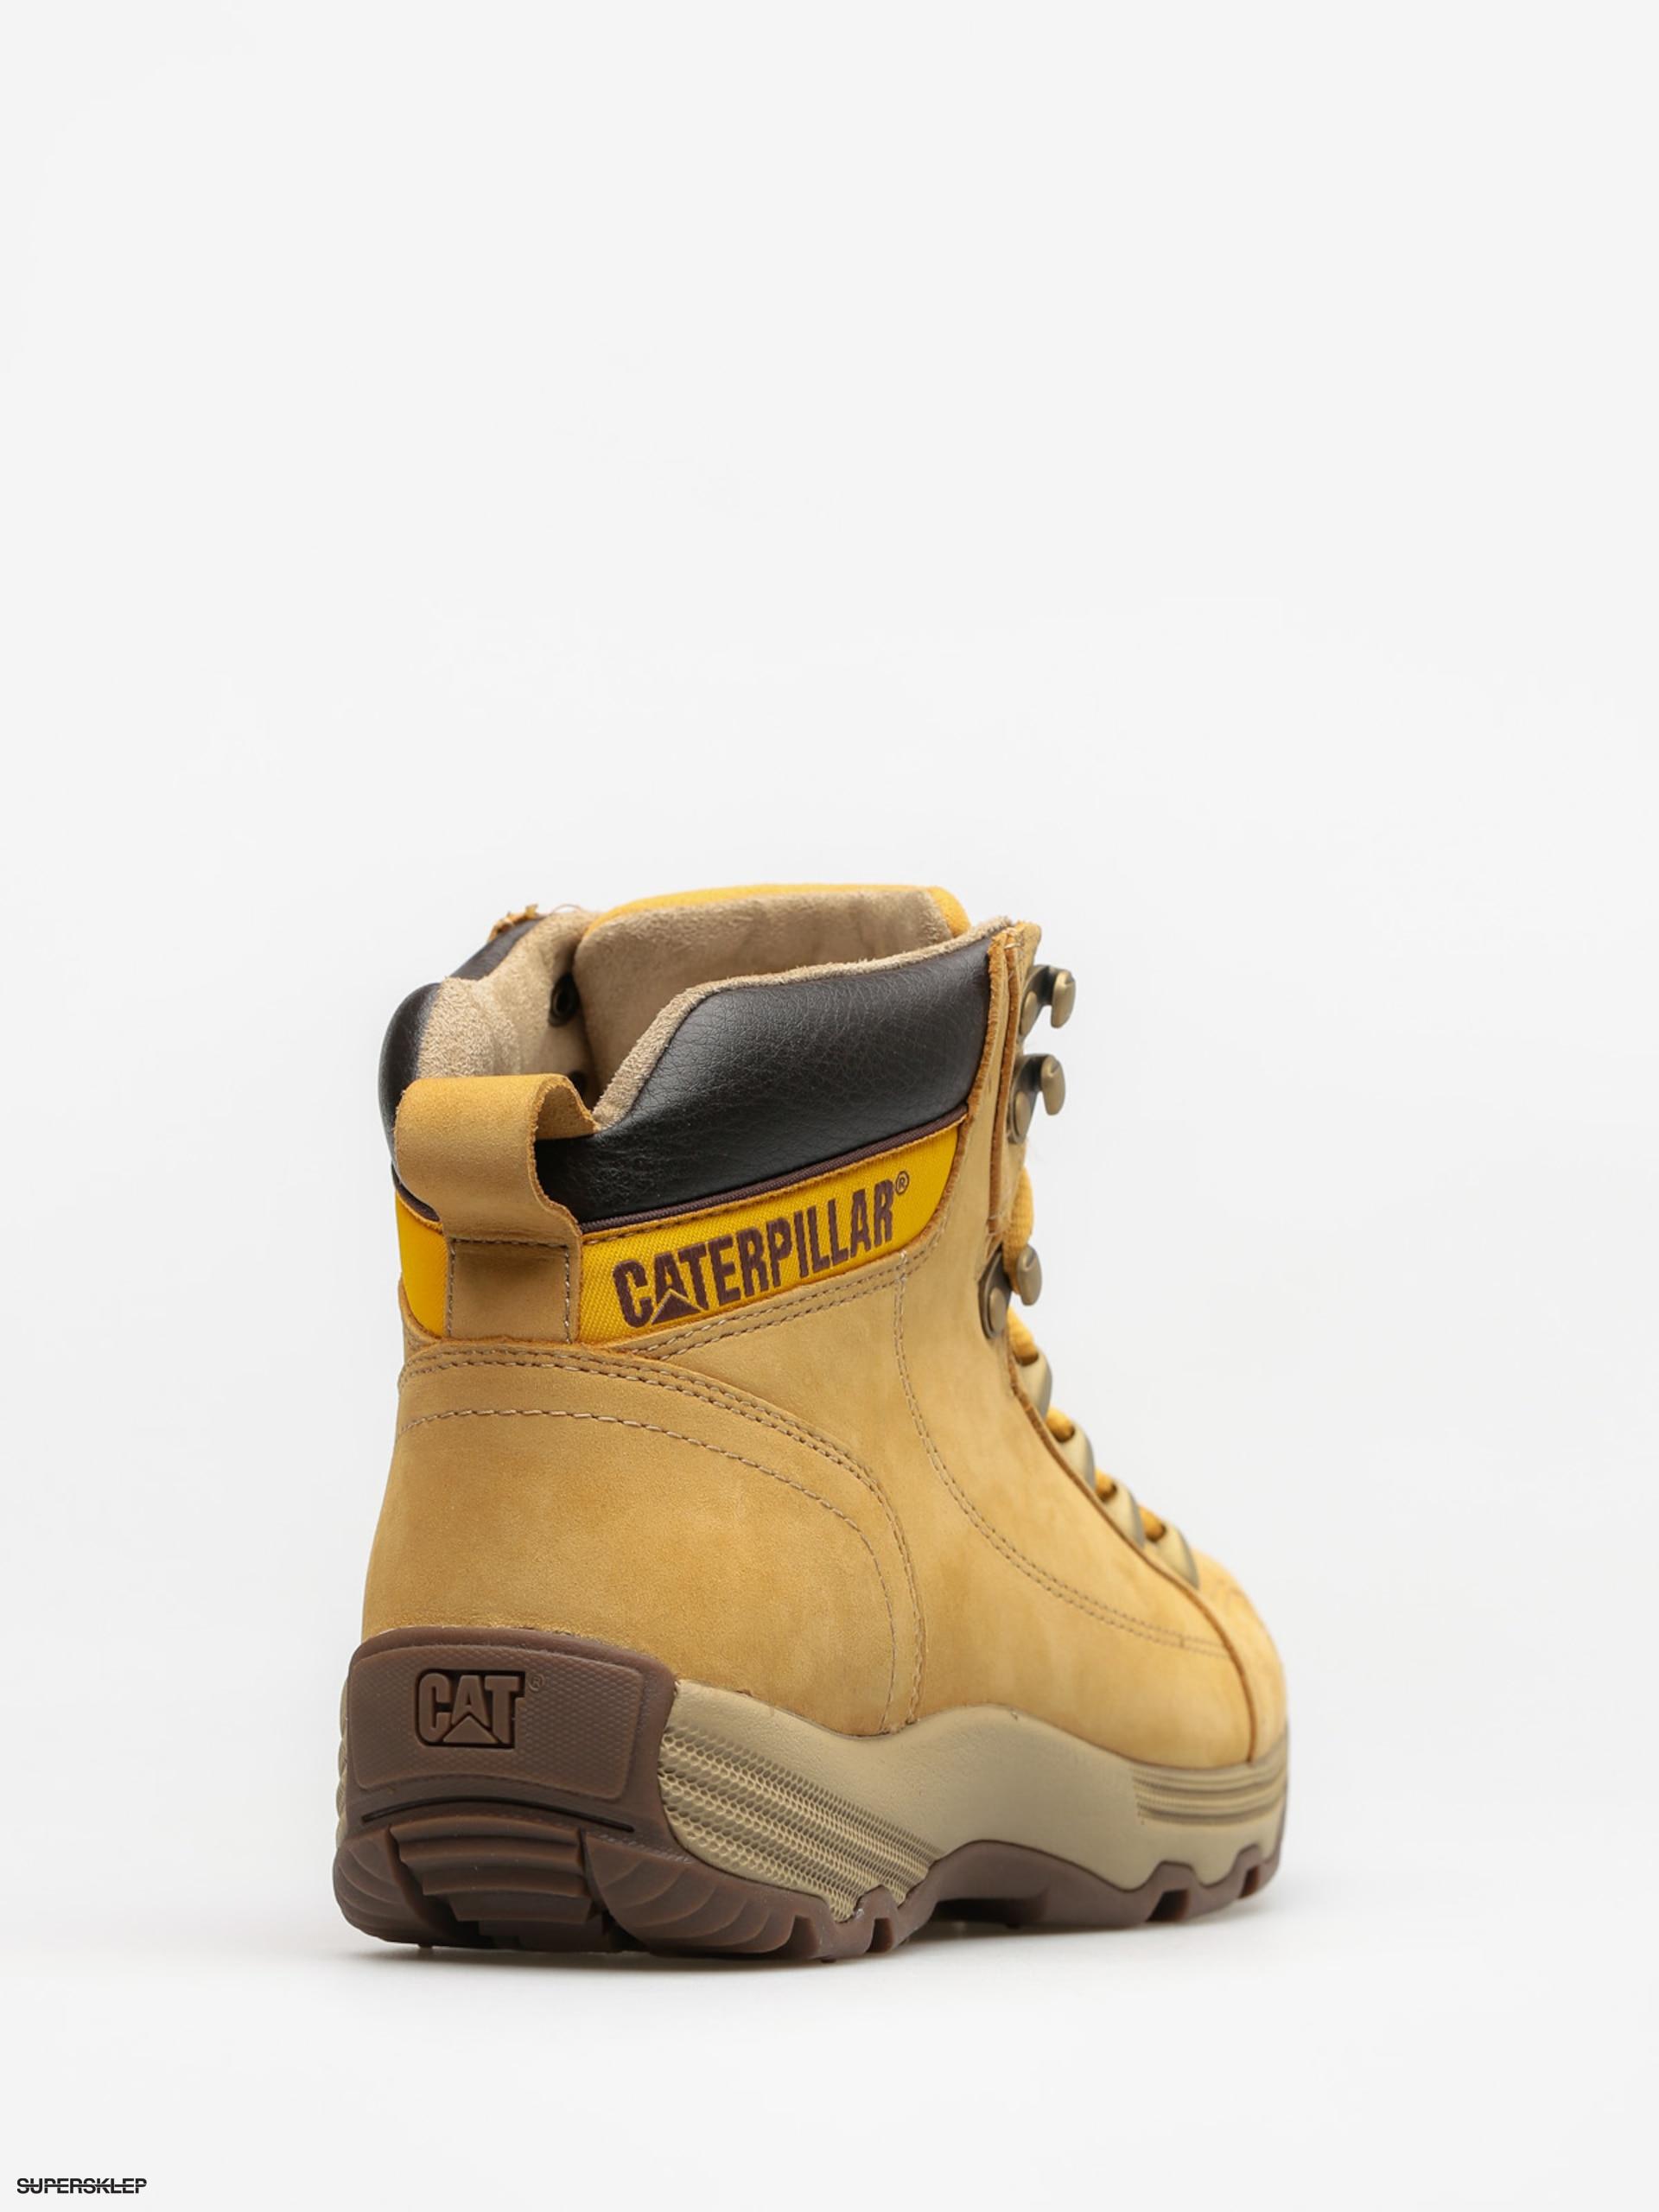 9a0b5bccba3 Zimné topánky Caterpillar Supersede (honey reset)